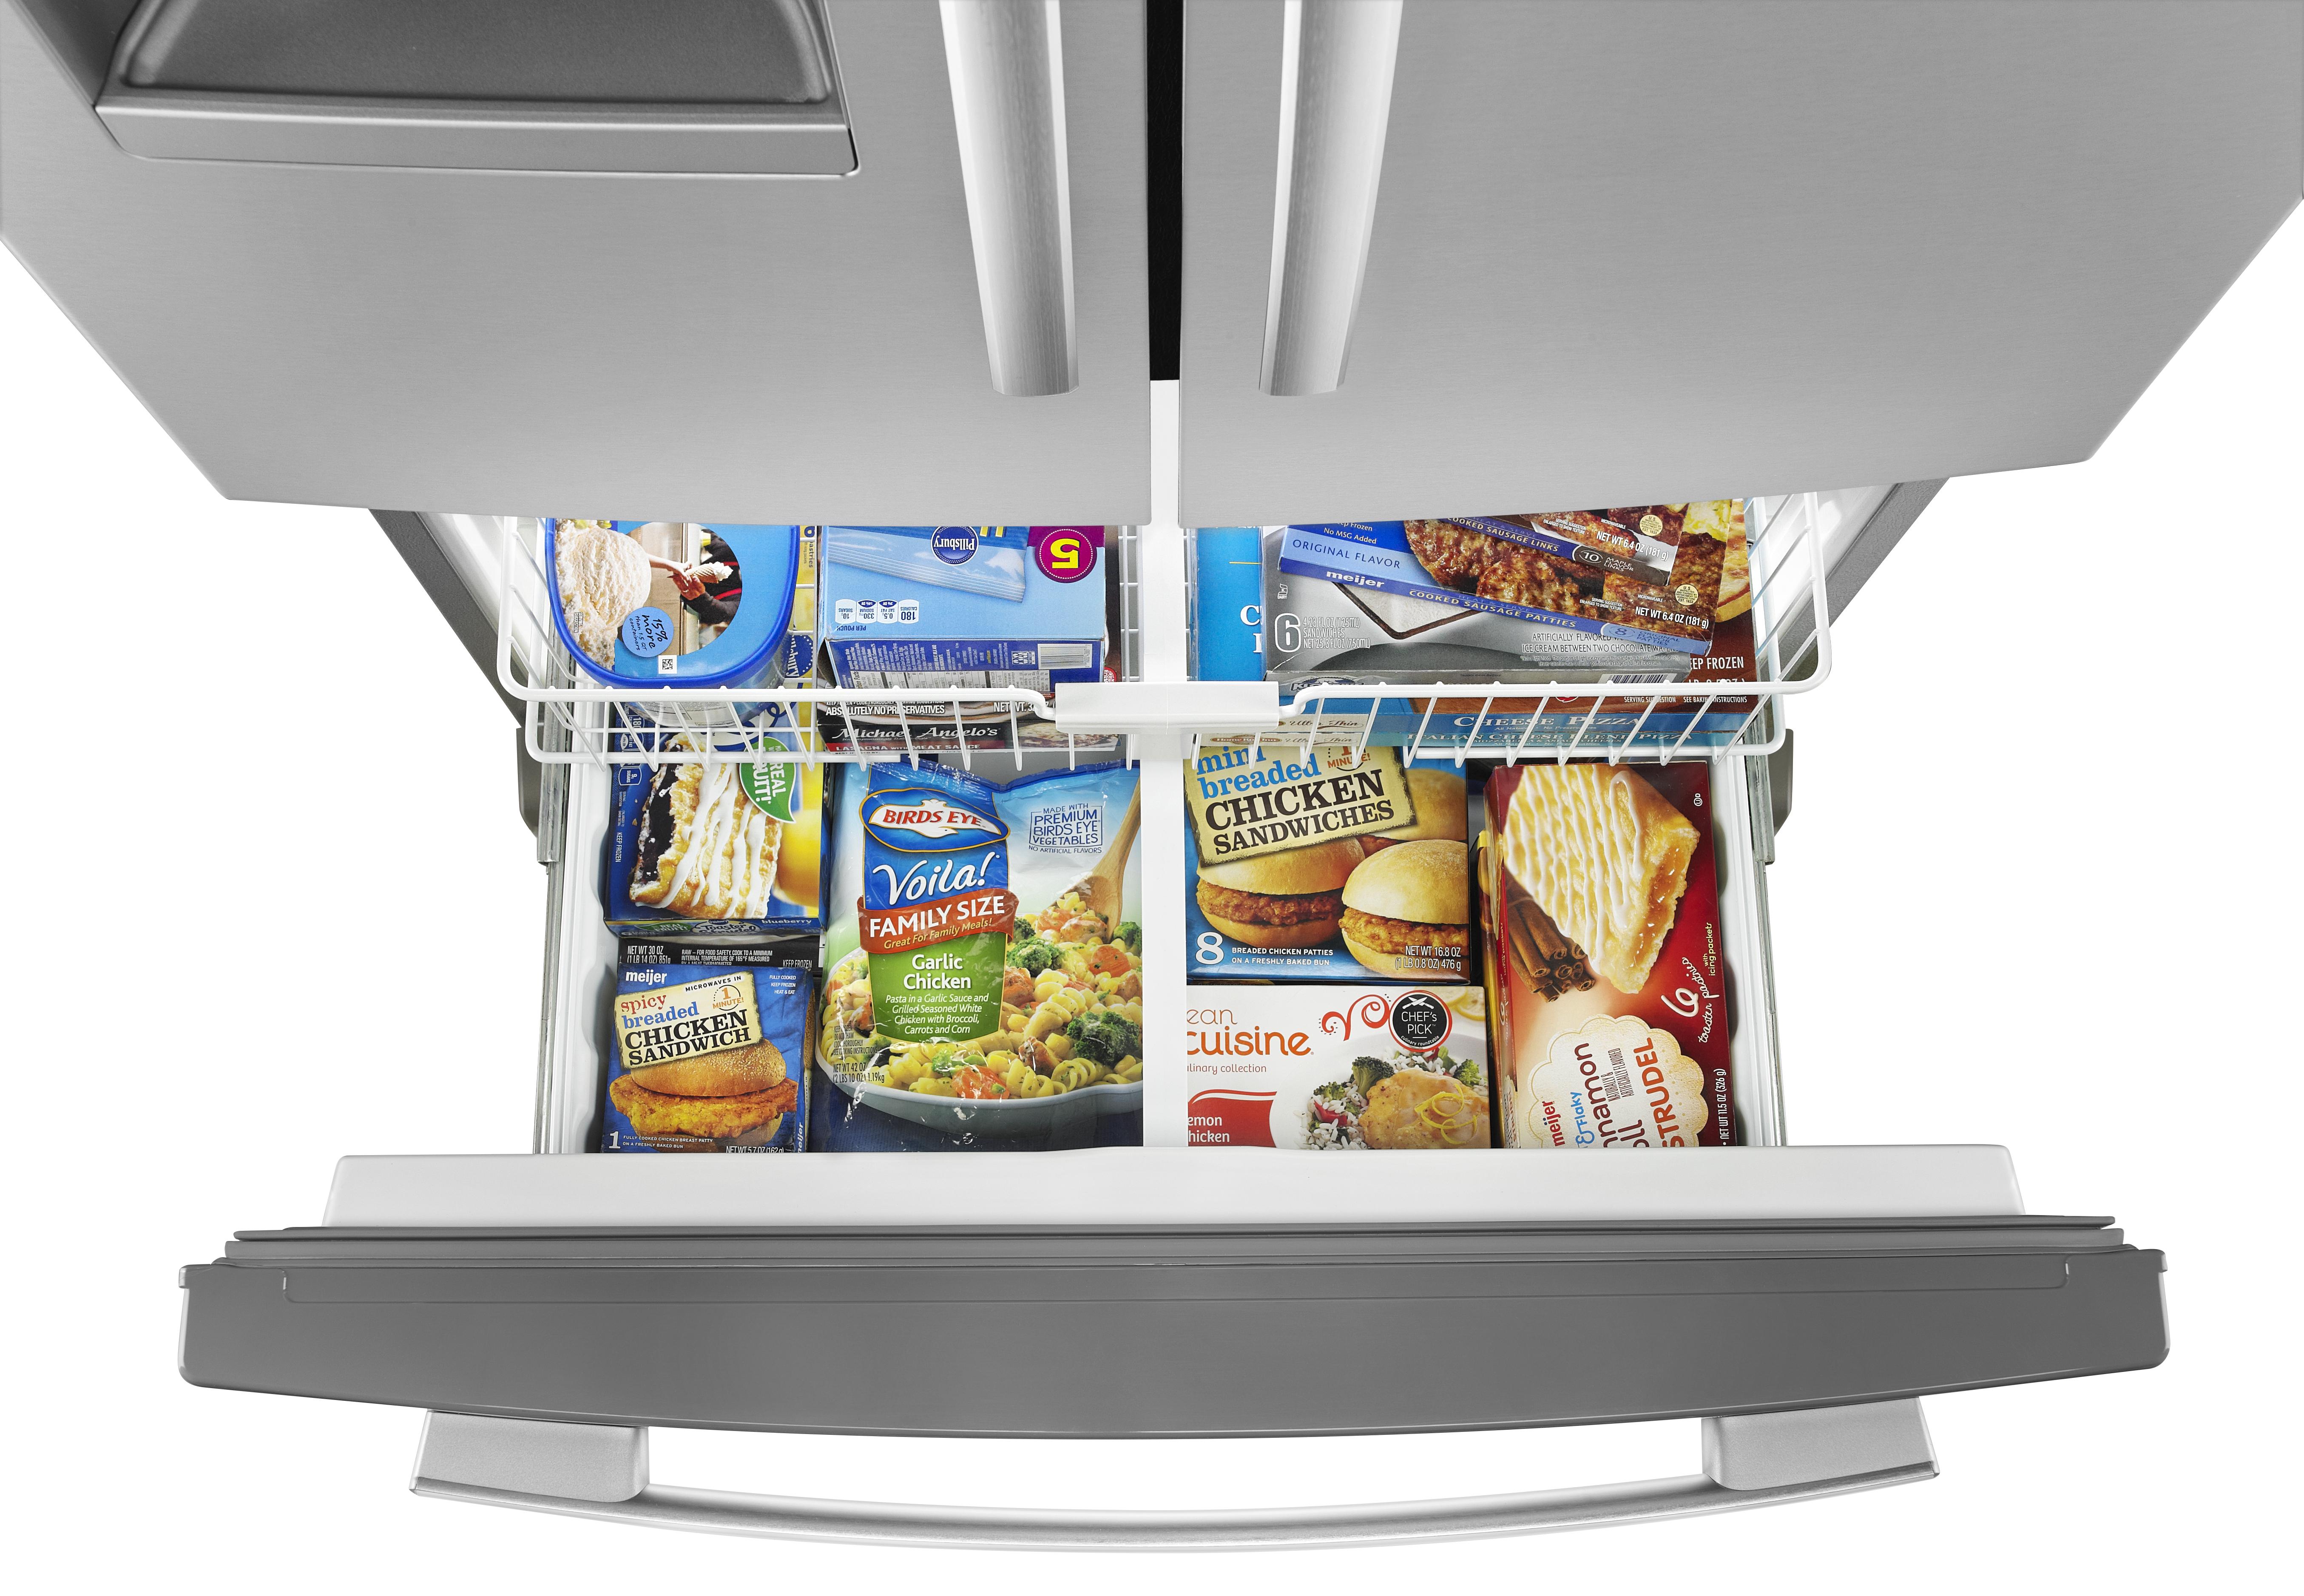 Amana 25 Cu Ft French Door Bottom Freezer Refrigerator Stainless Lock Ampamp Ordinary Crisper Hpl932d700ml 247 Monochromatic Steel